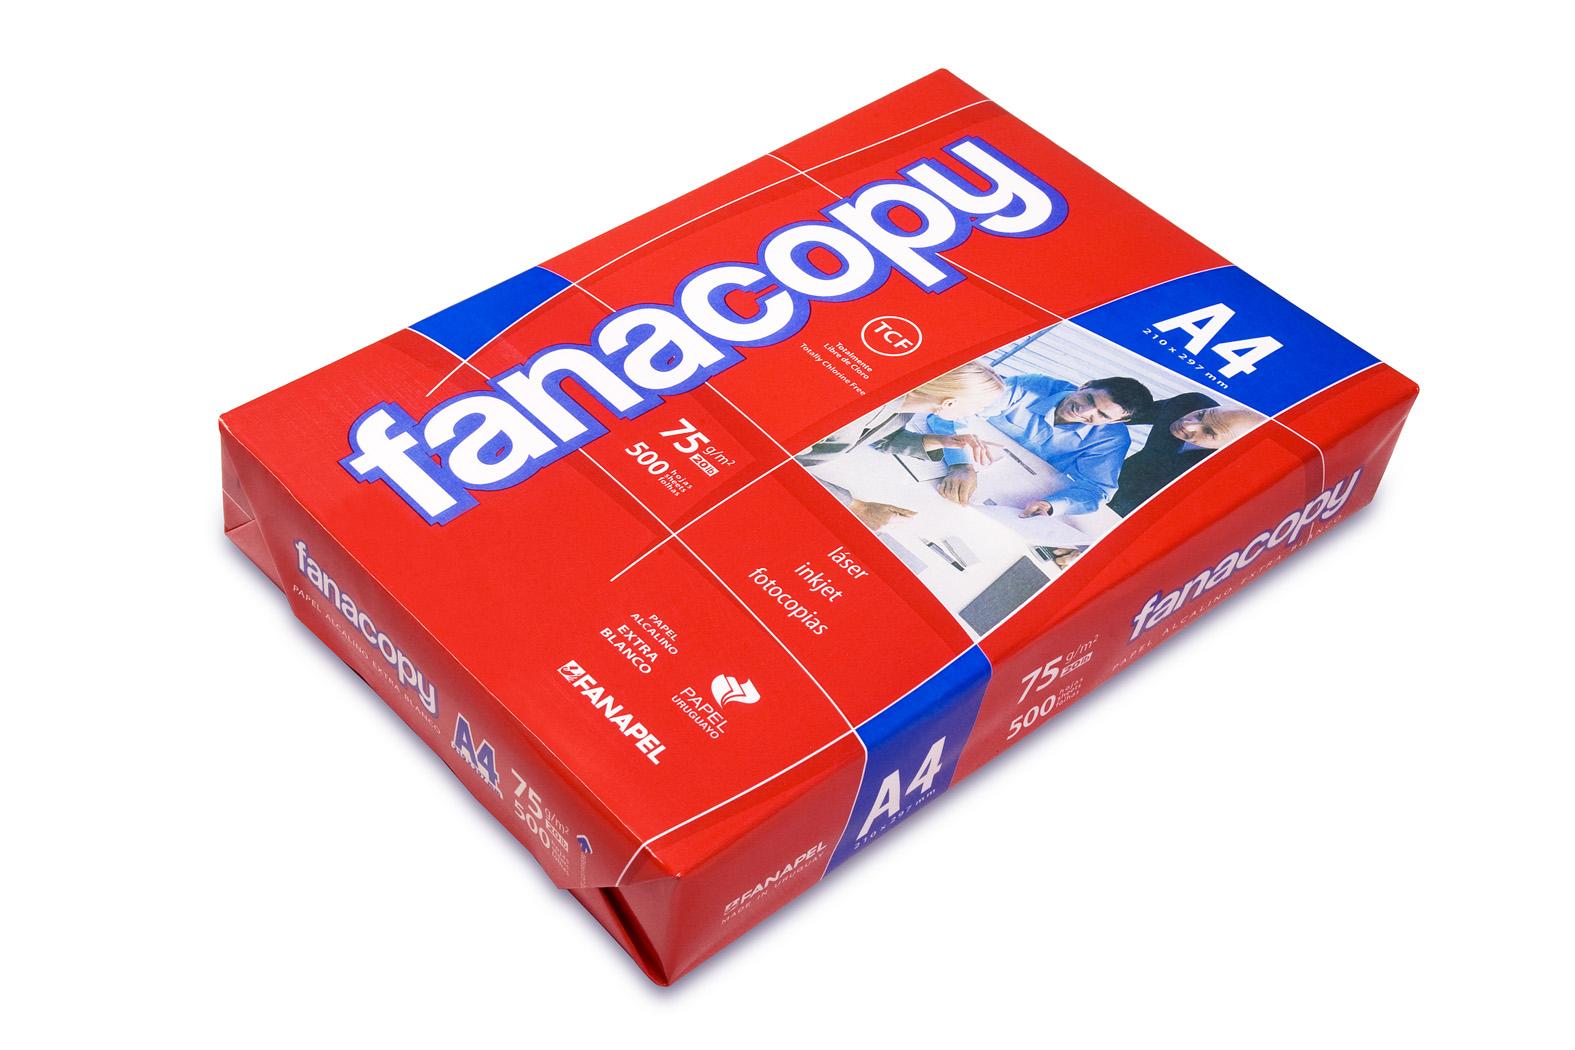 fanacoy-A4